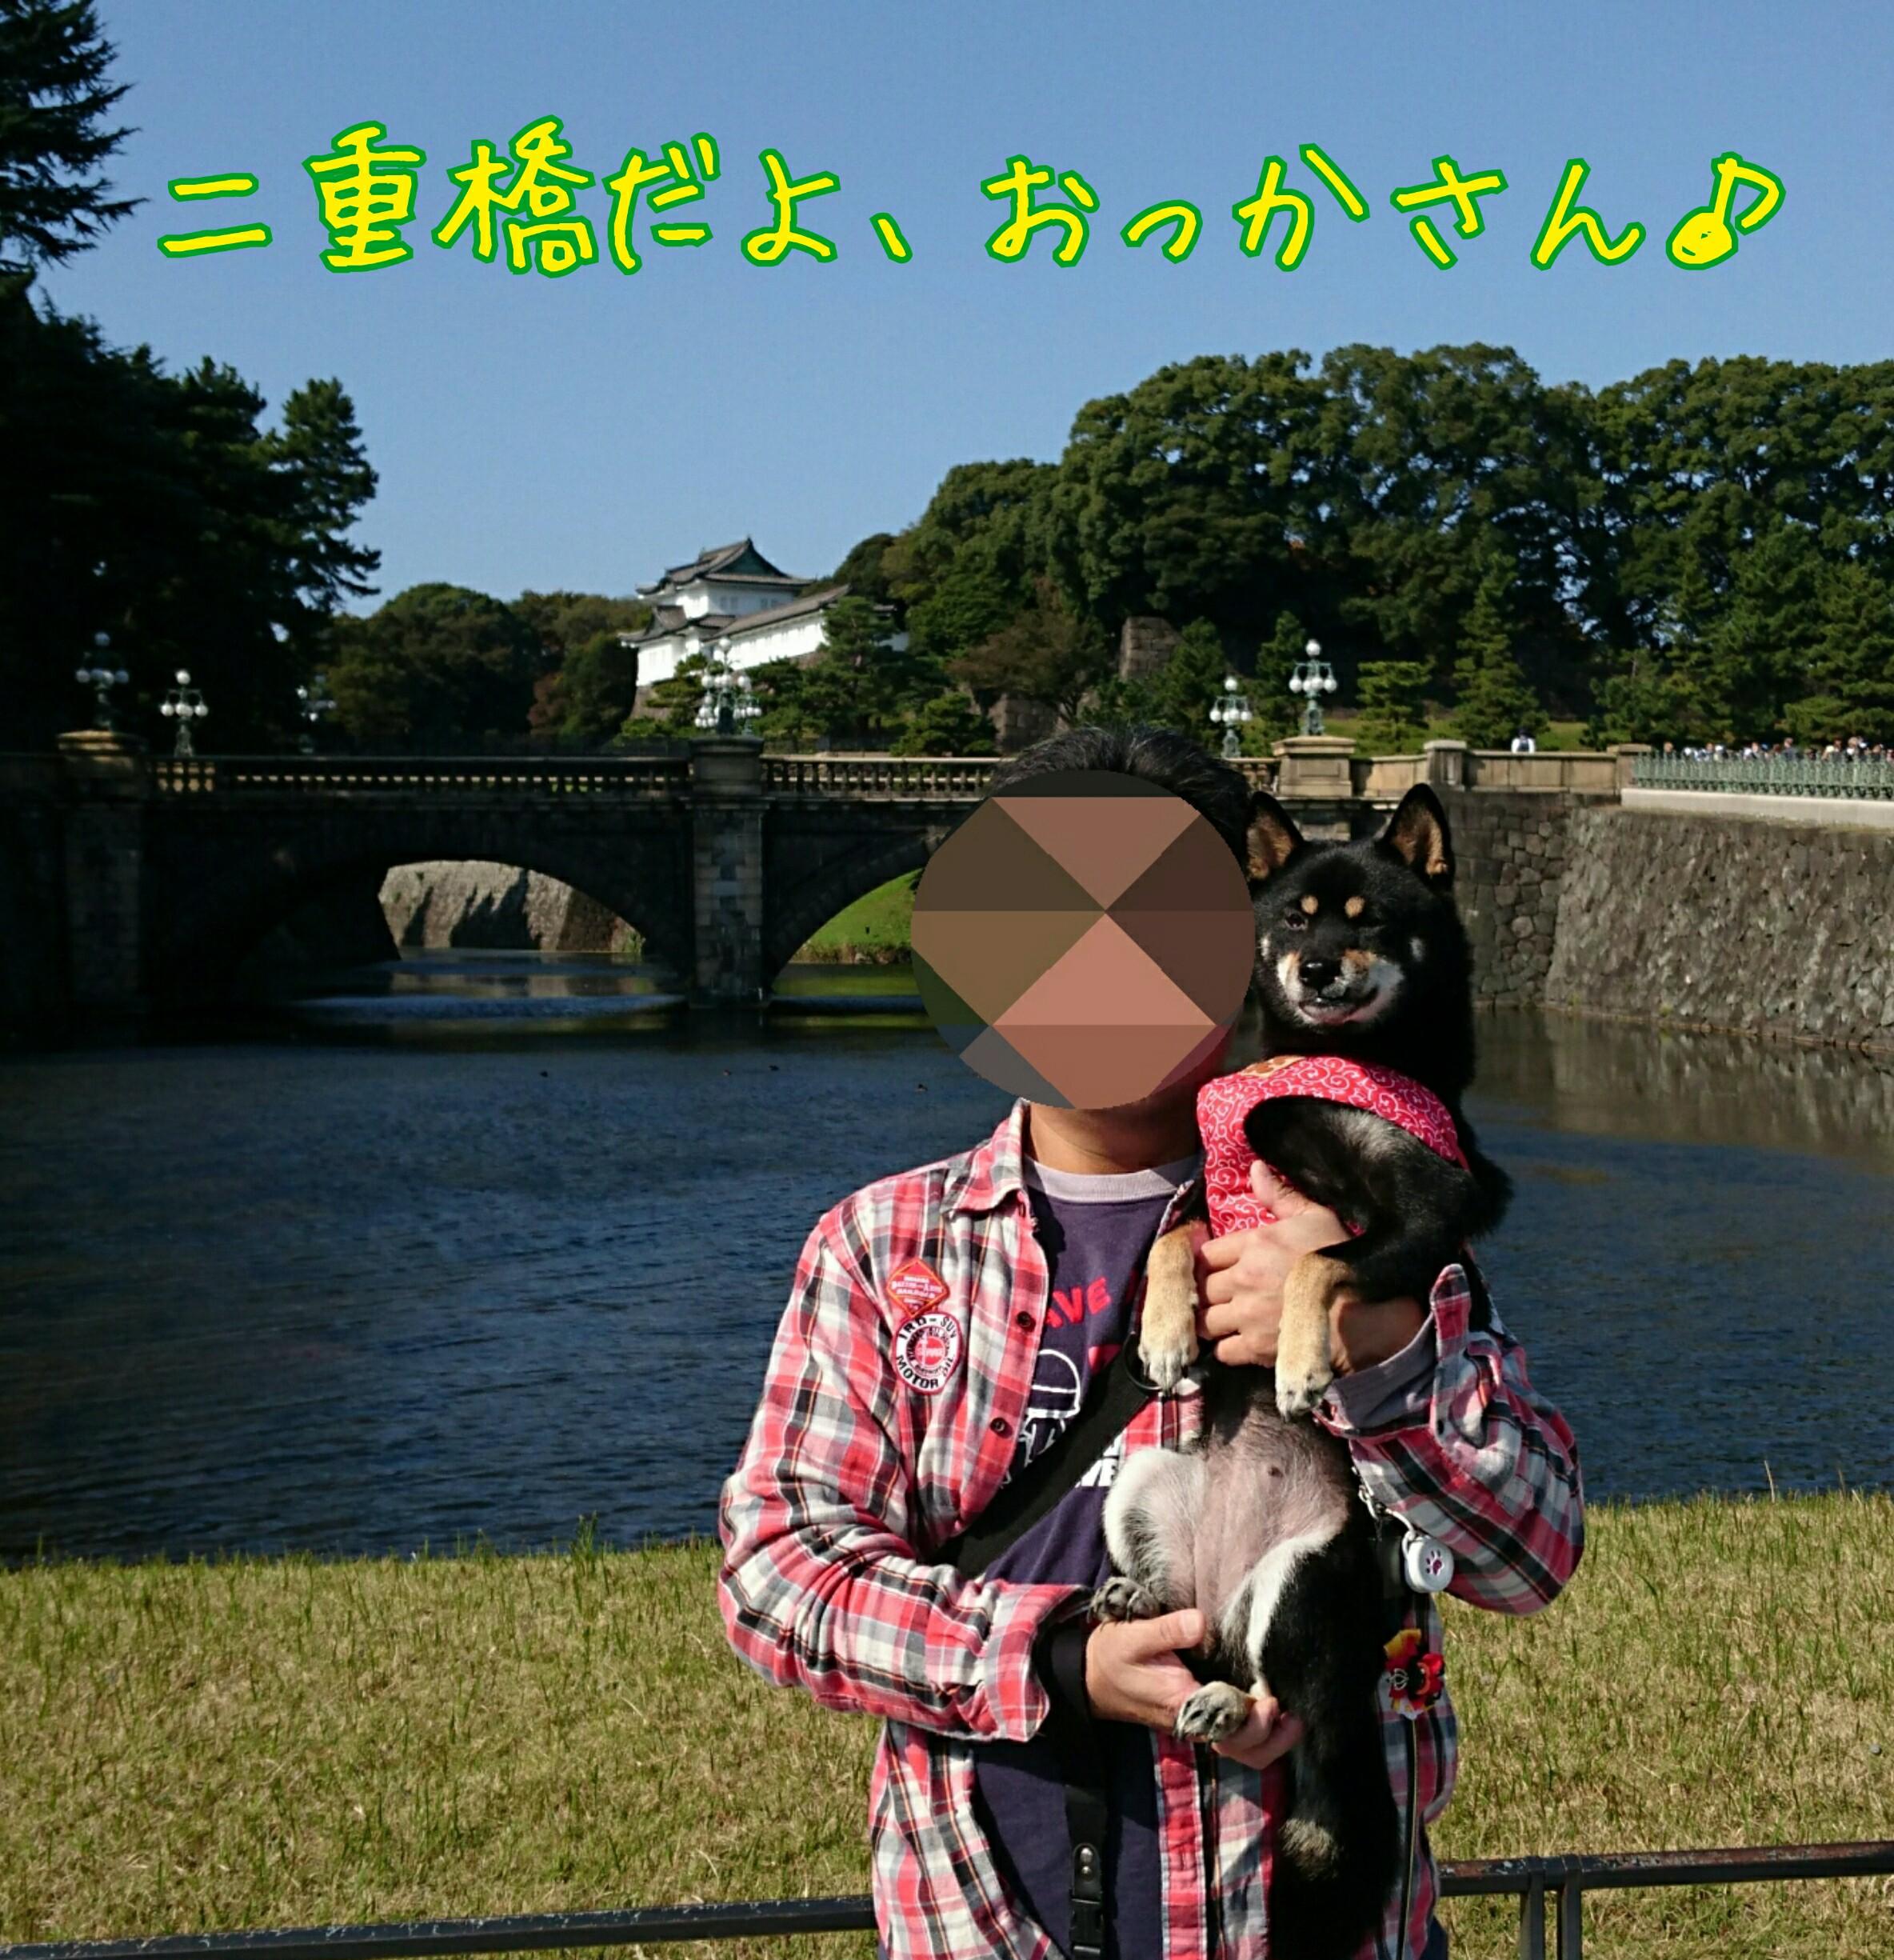 201611131046276fa.jpg